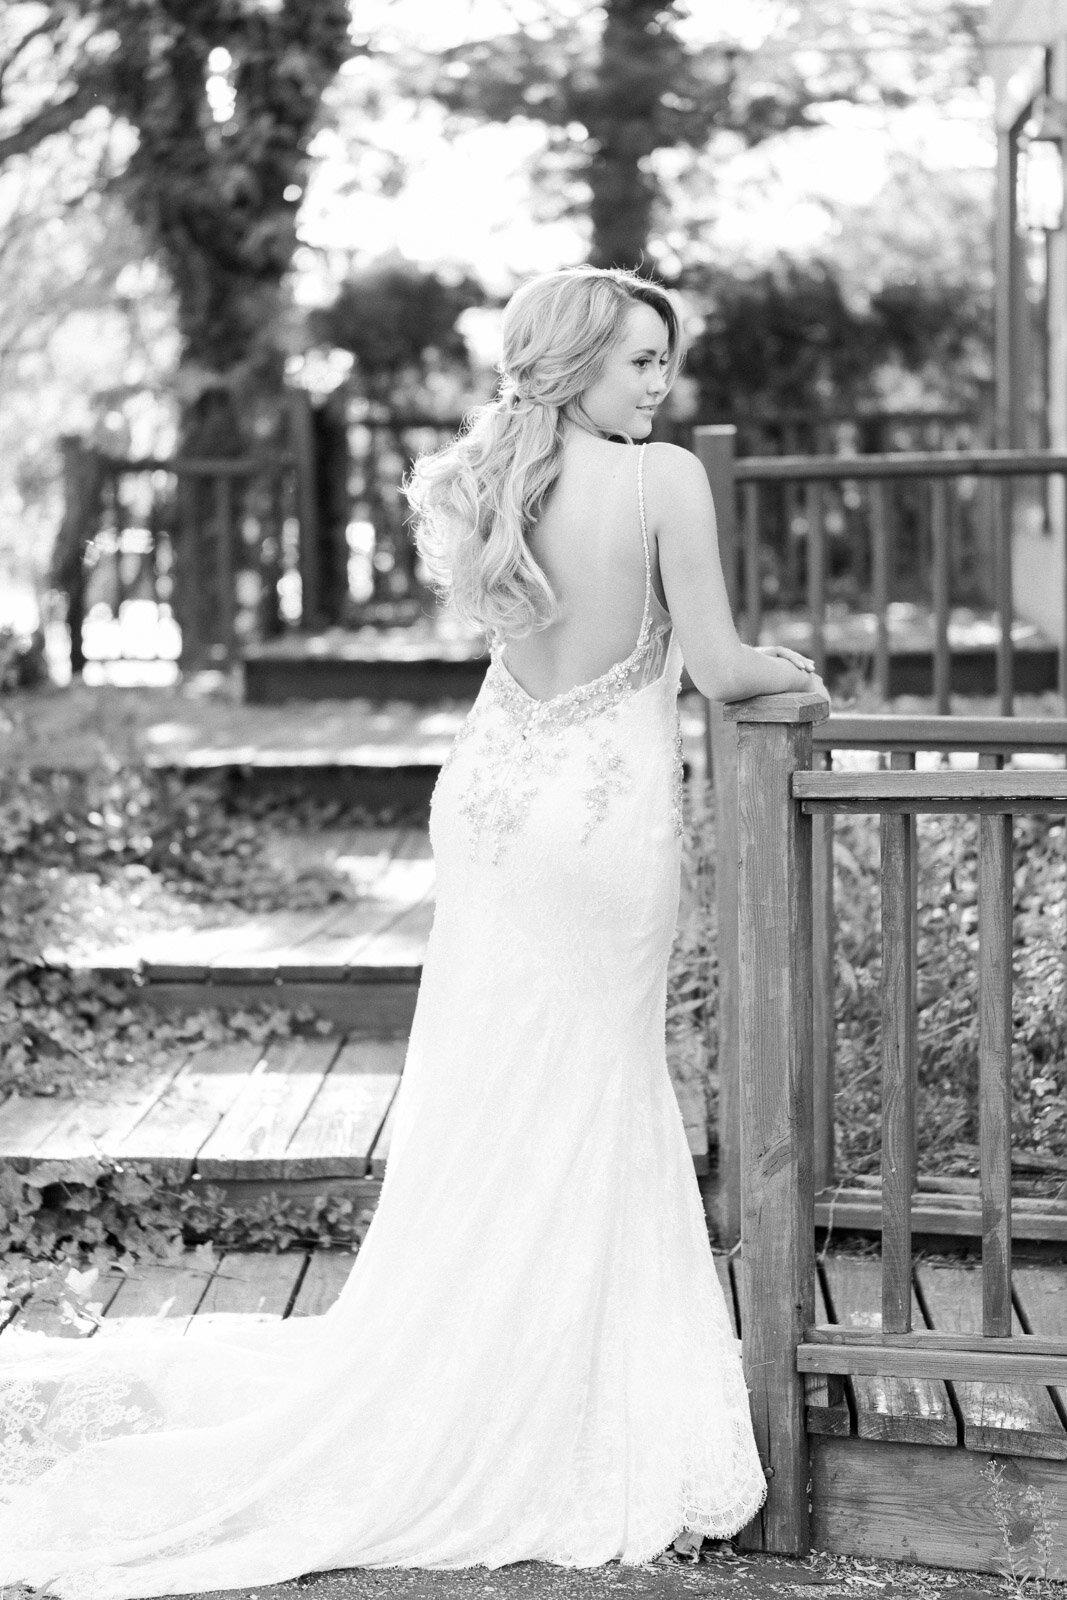 9876543456789876545678 Cleveland+Wedding+Dress+Boutique,+Radiant+Bride+by+Cleveland+Wedding+Photographer+Matt+Erickson+Photography.jpg